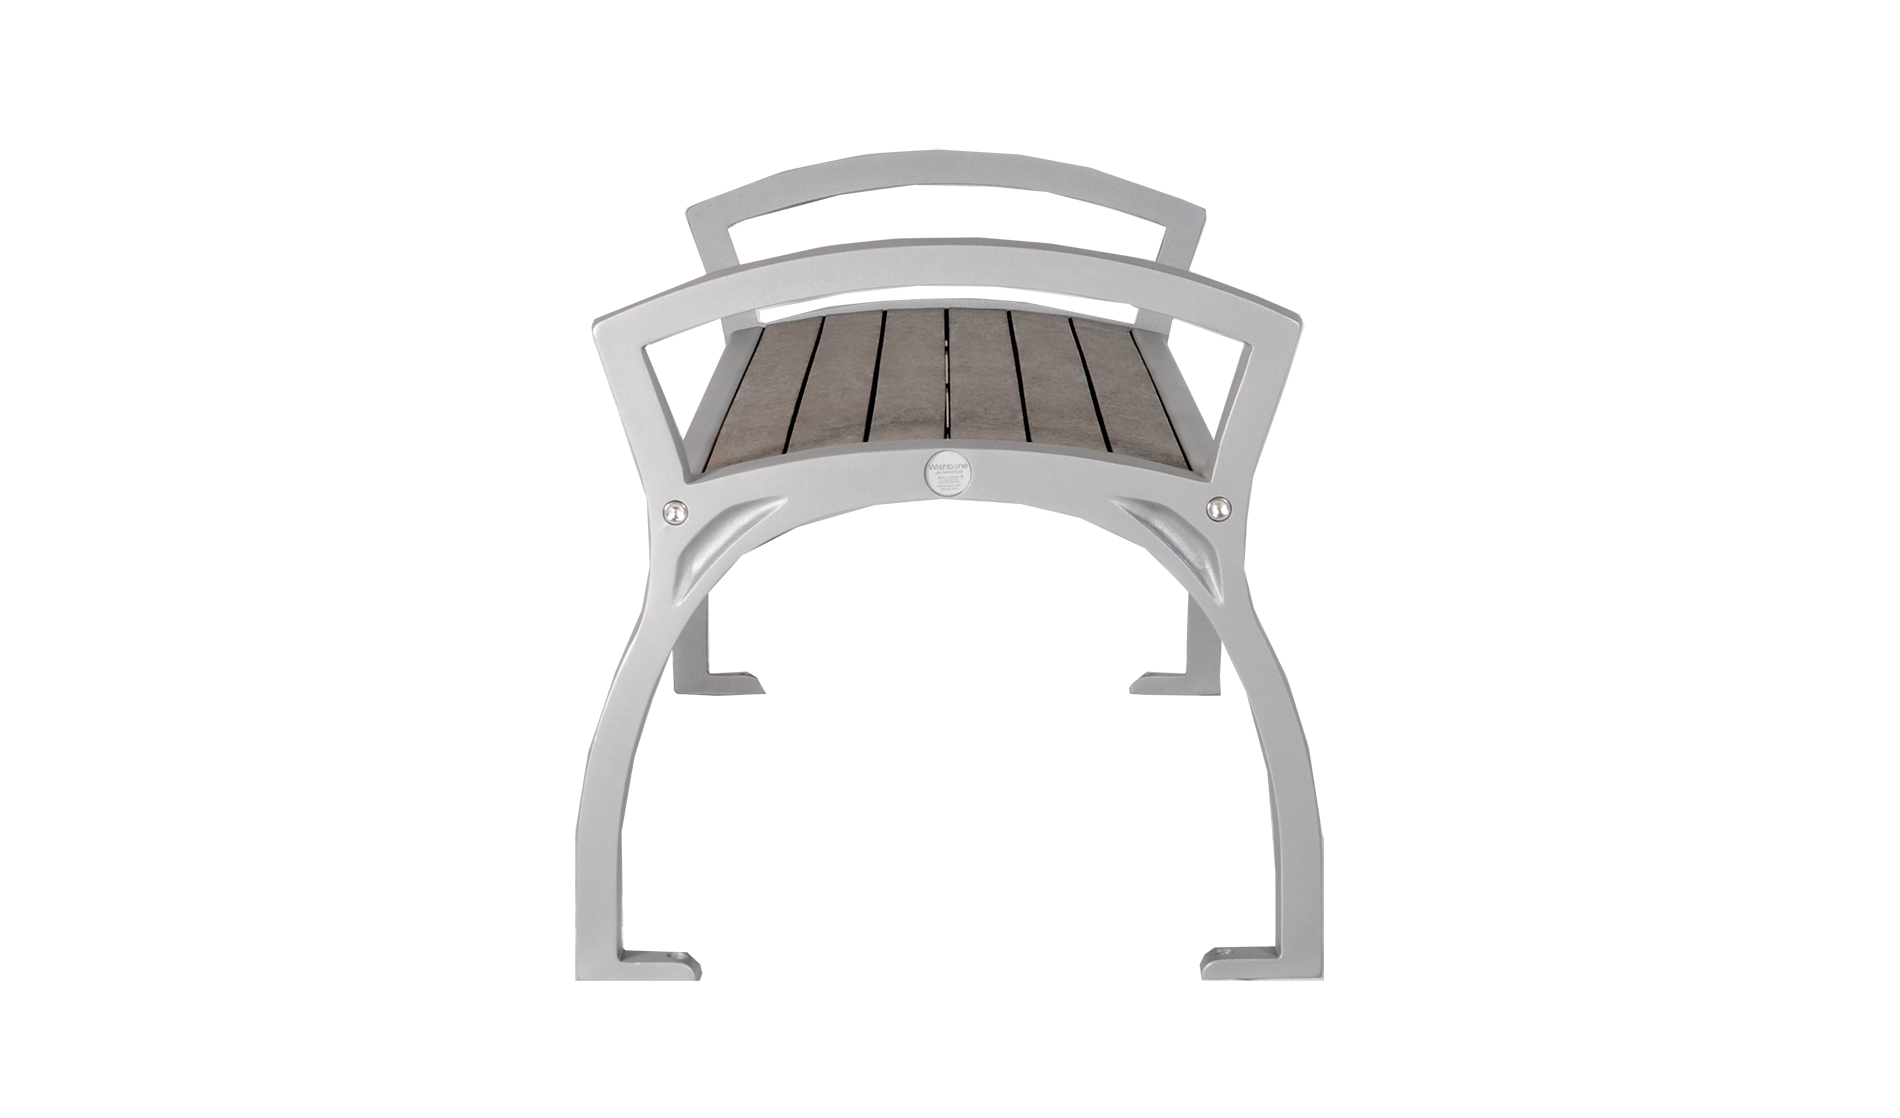 Tremendous Modena Straight Park Bench Wishbone Site Furnishings Ibusinesslaw Wood Chair Design Ideas Ibusinesslaworg